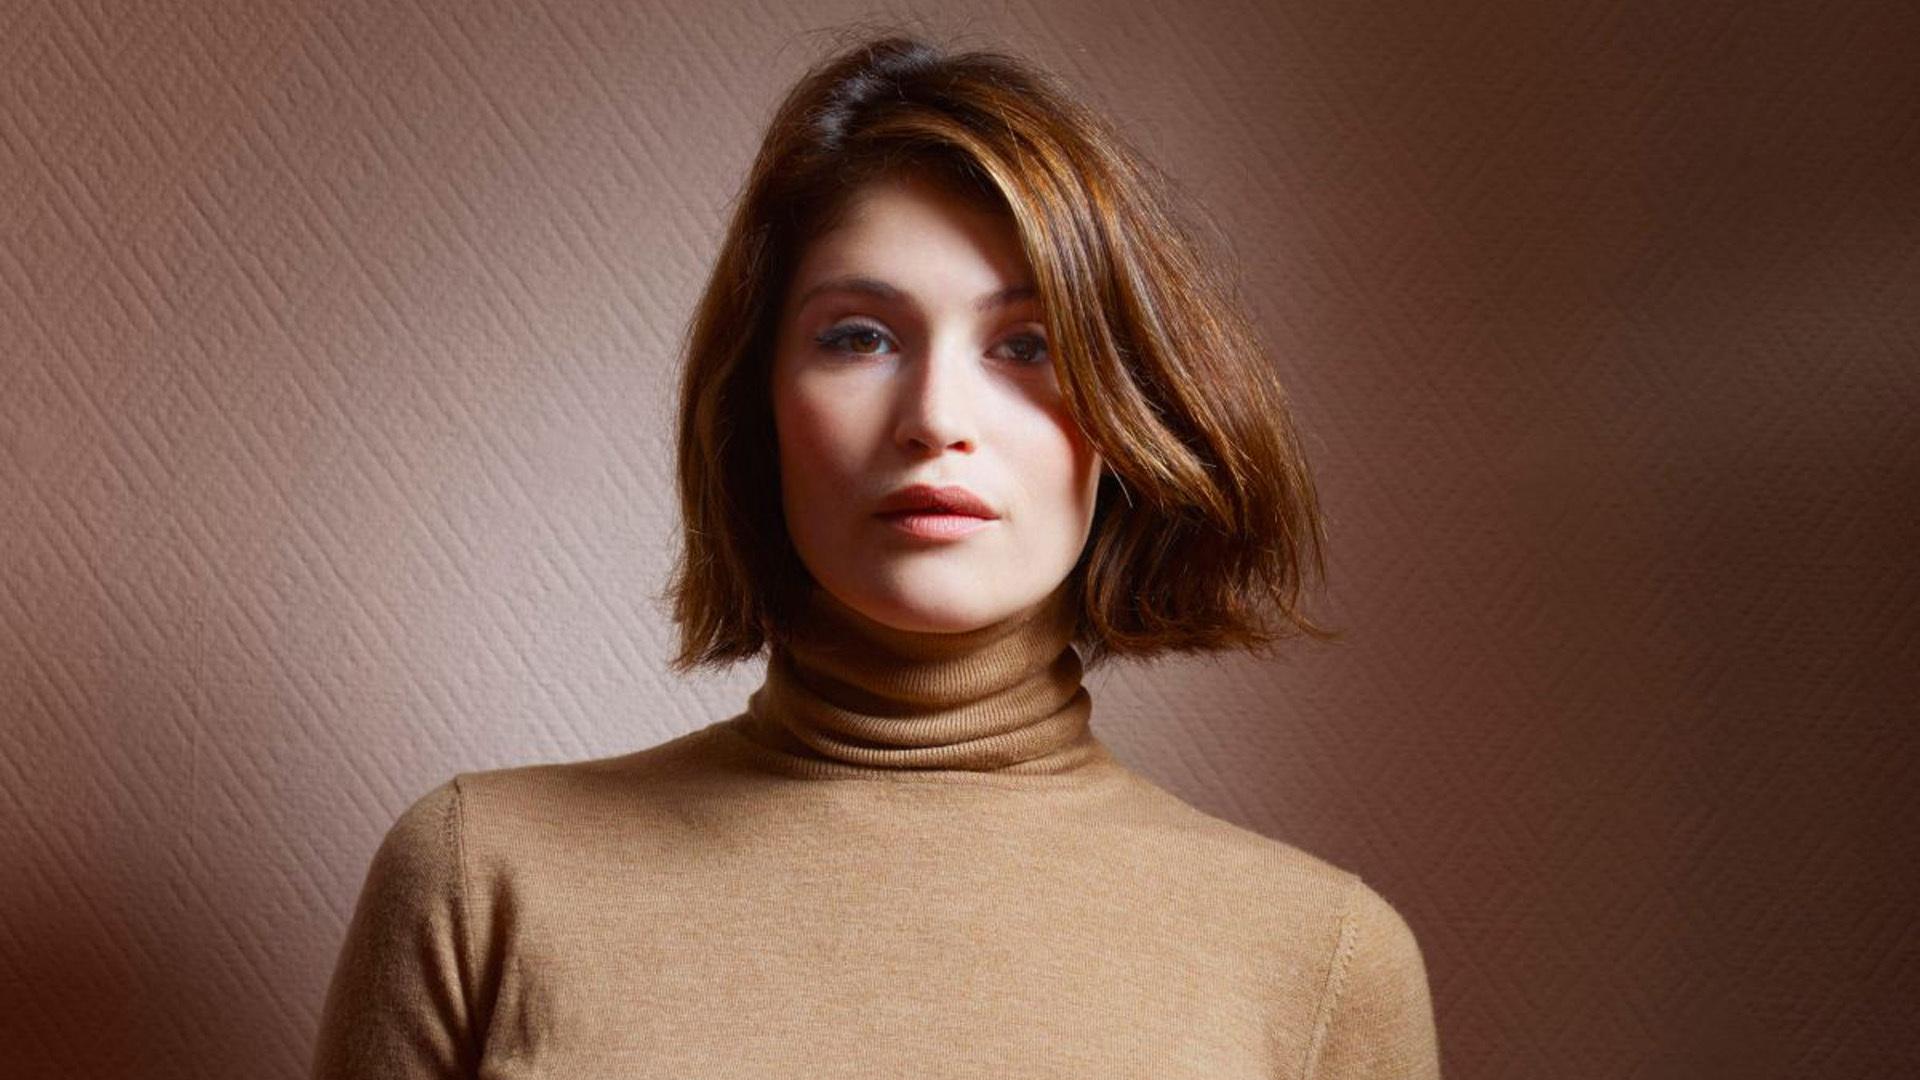 Gemma Arterton For Desktop